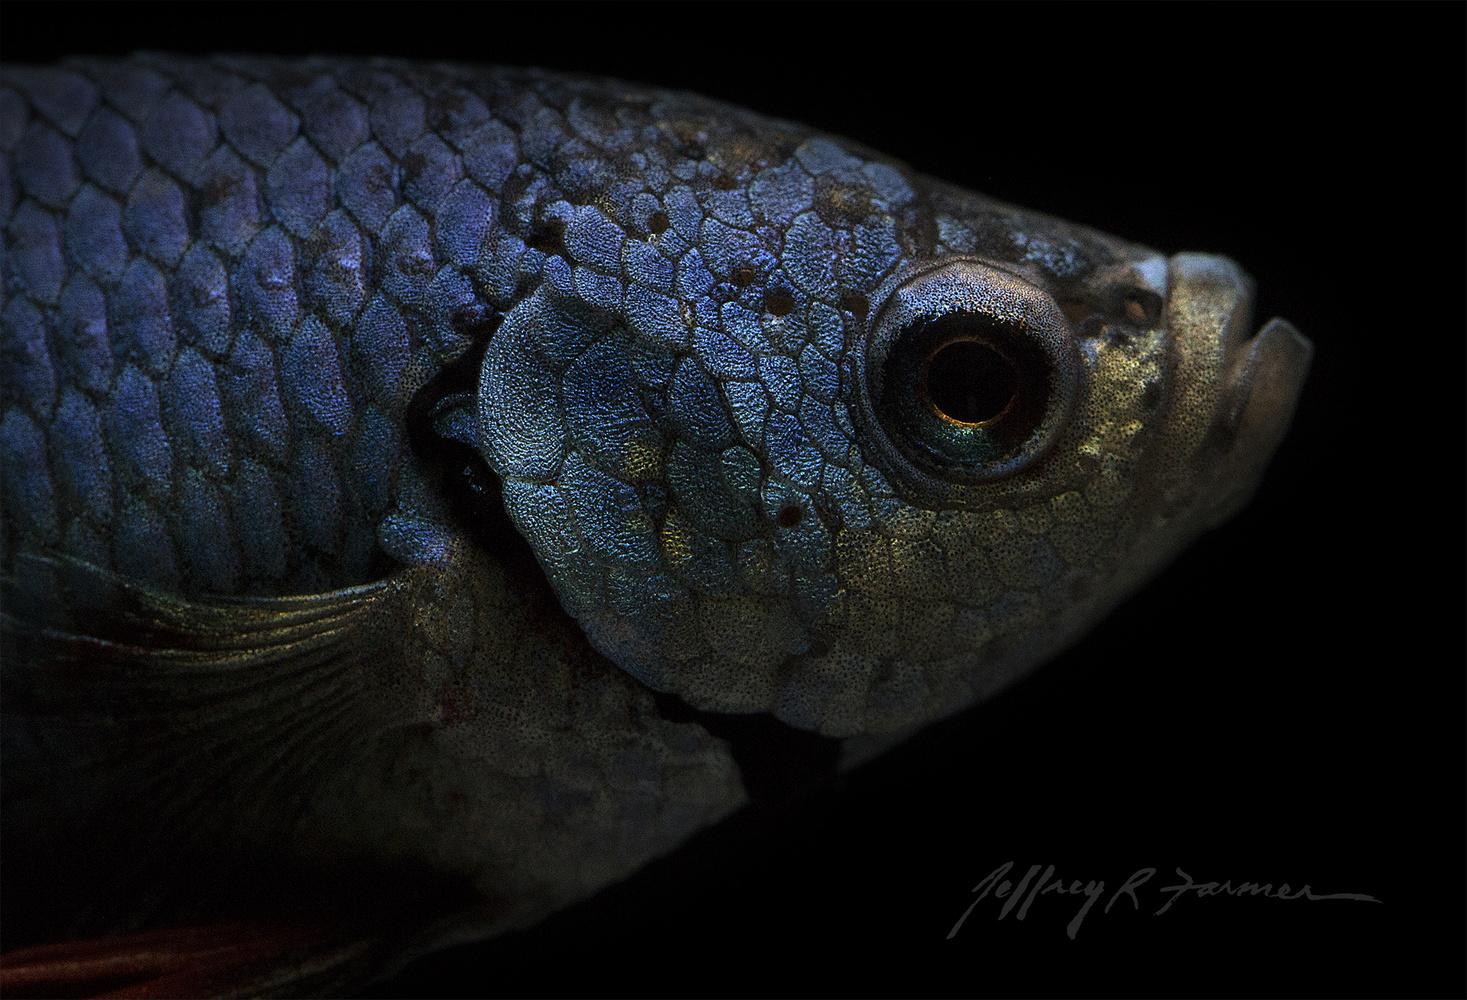 Betta Close-up by Jeffrey R Farmer